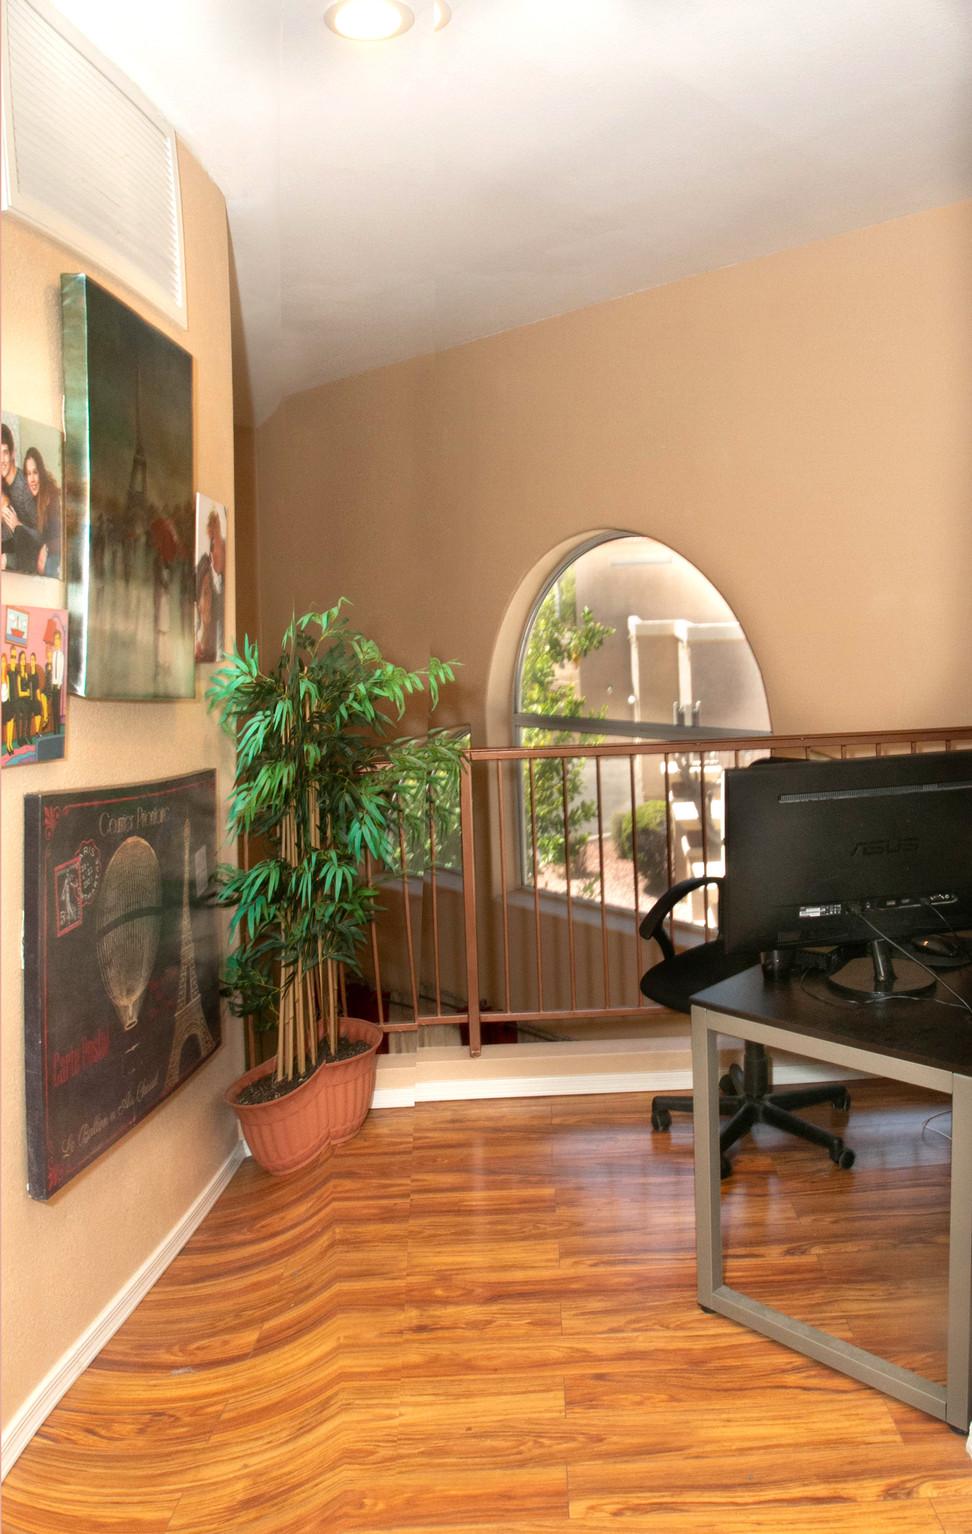 Interiors-2.jpg